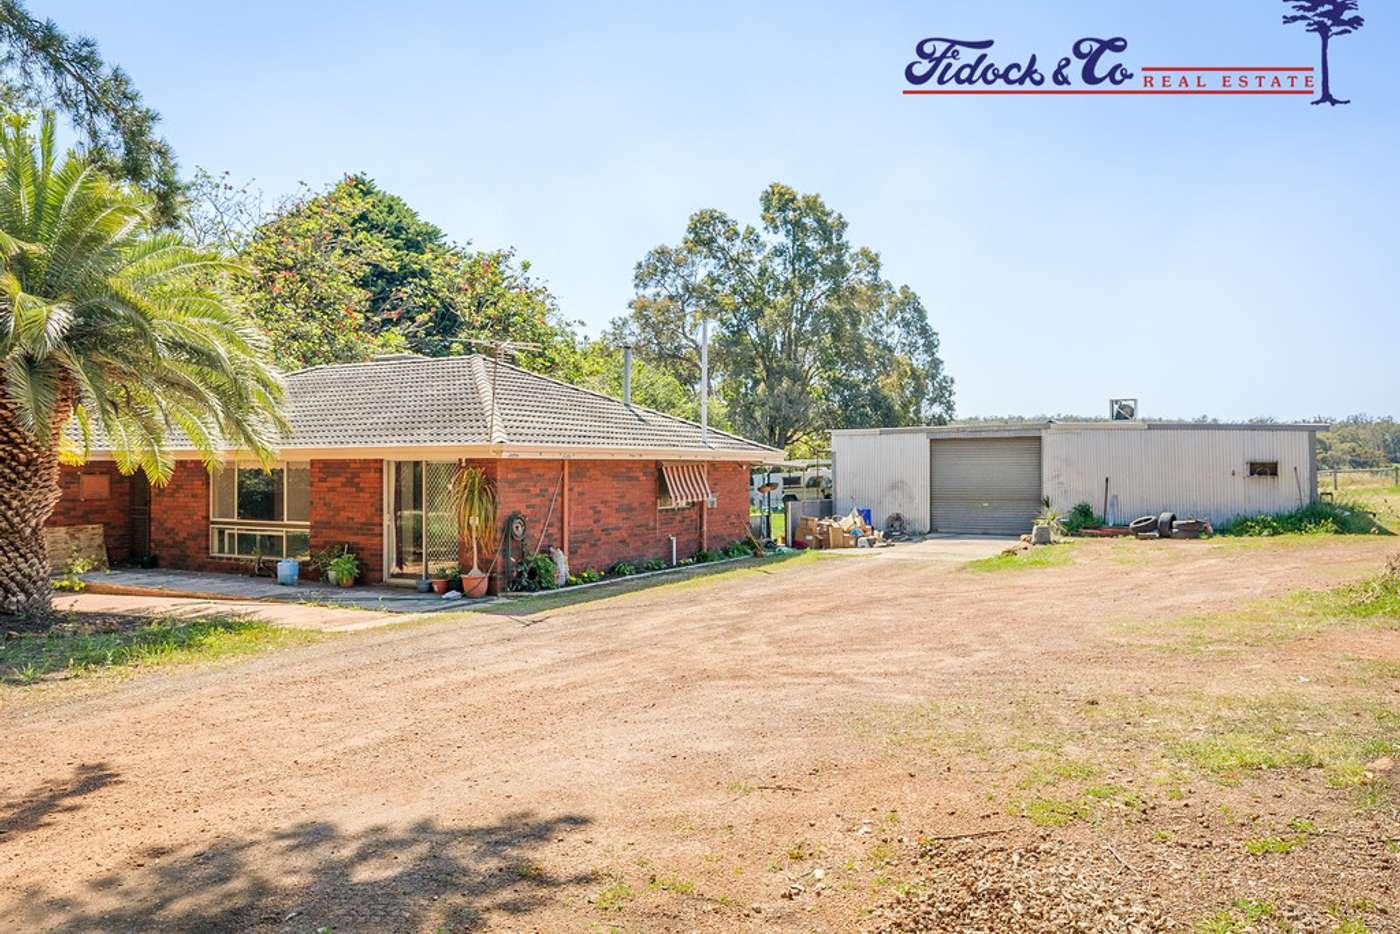 Main view of Homely house listing, 16 Raeburn Road, Roleystone WA 6111